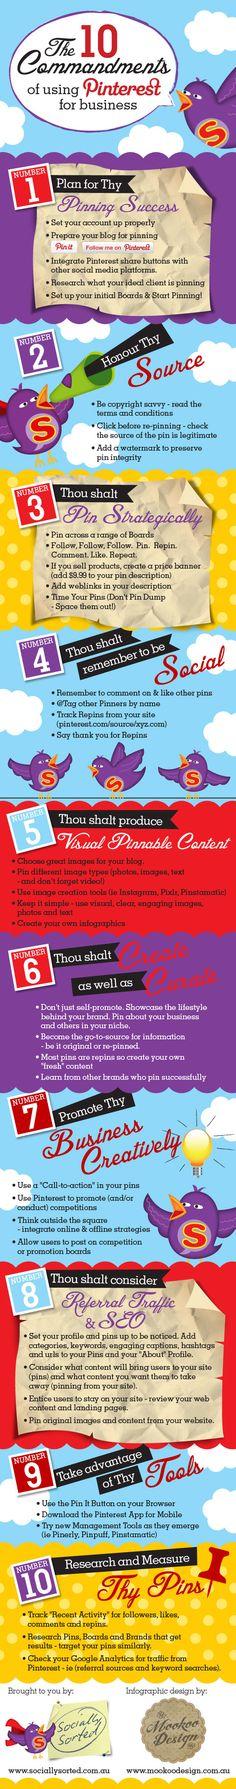 Pinterest Business Commandments